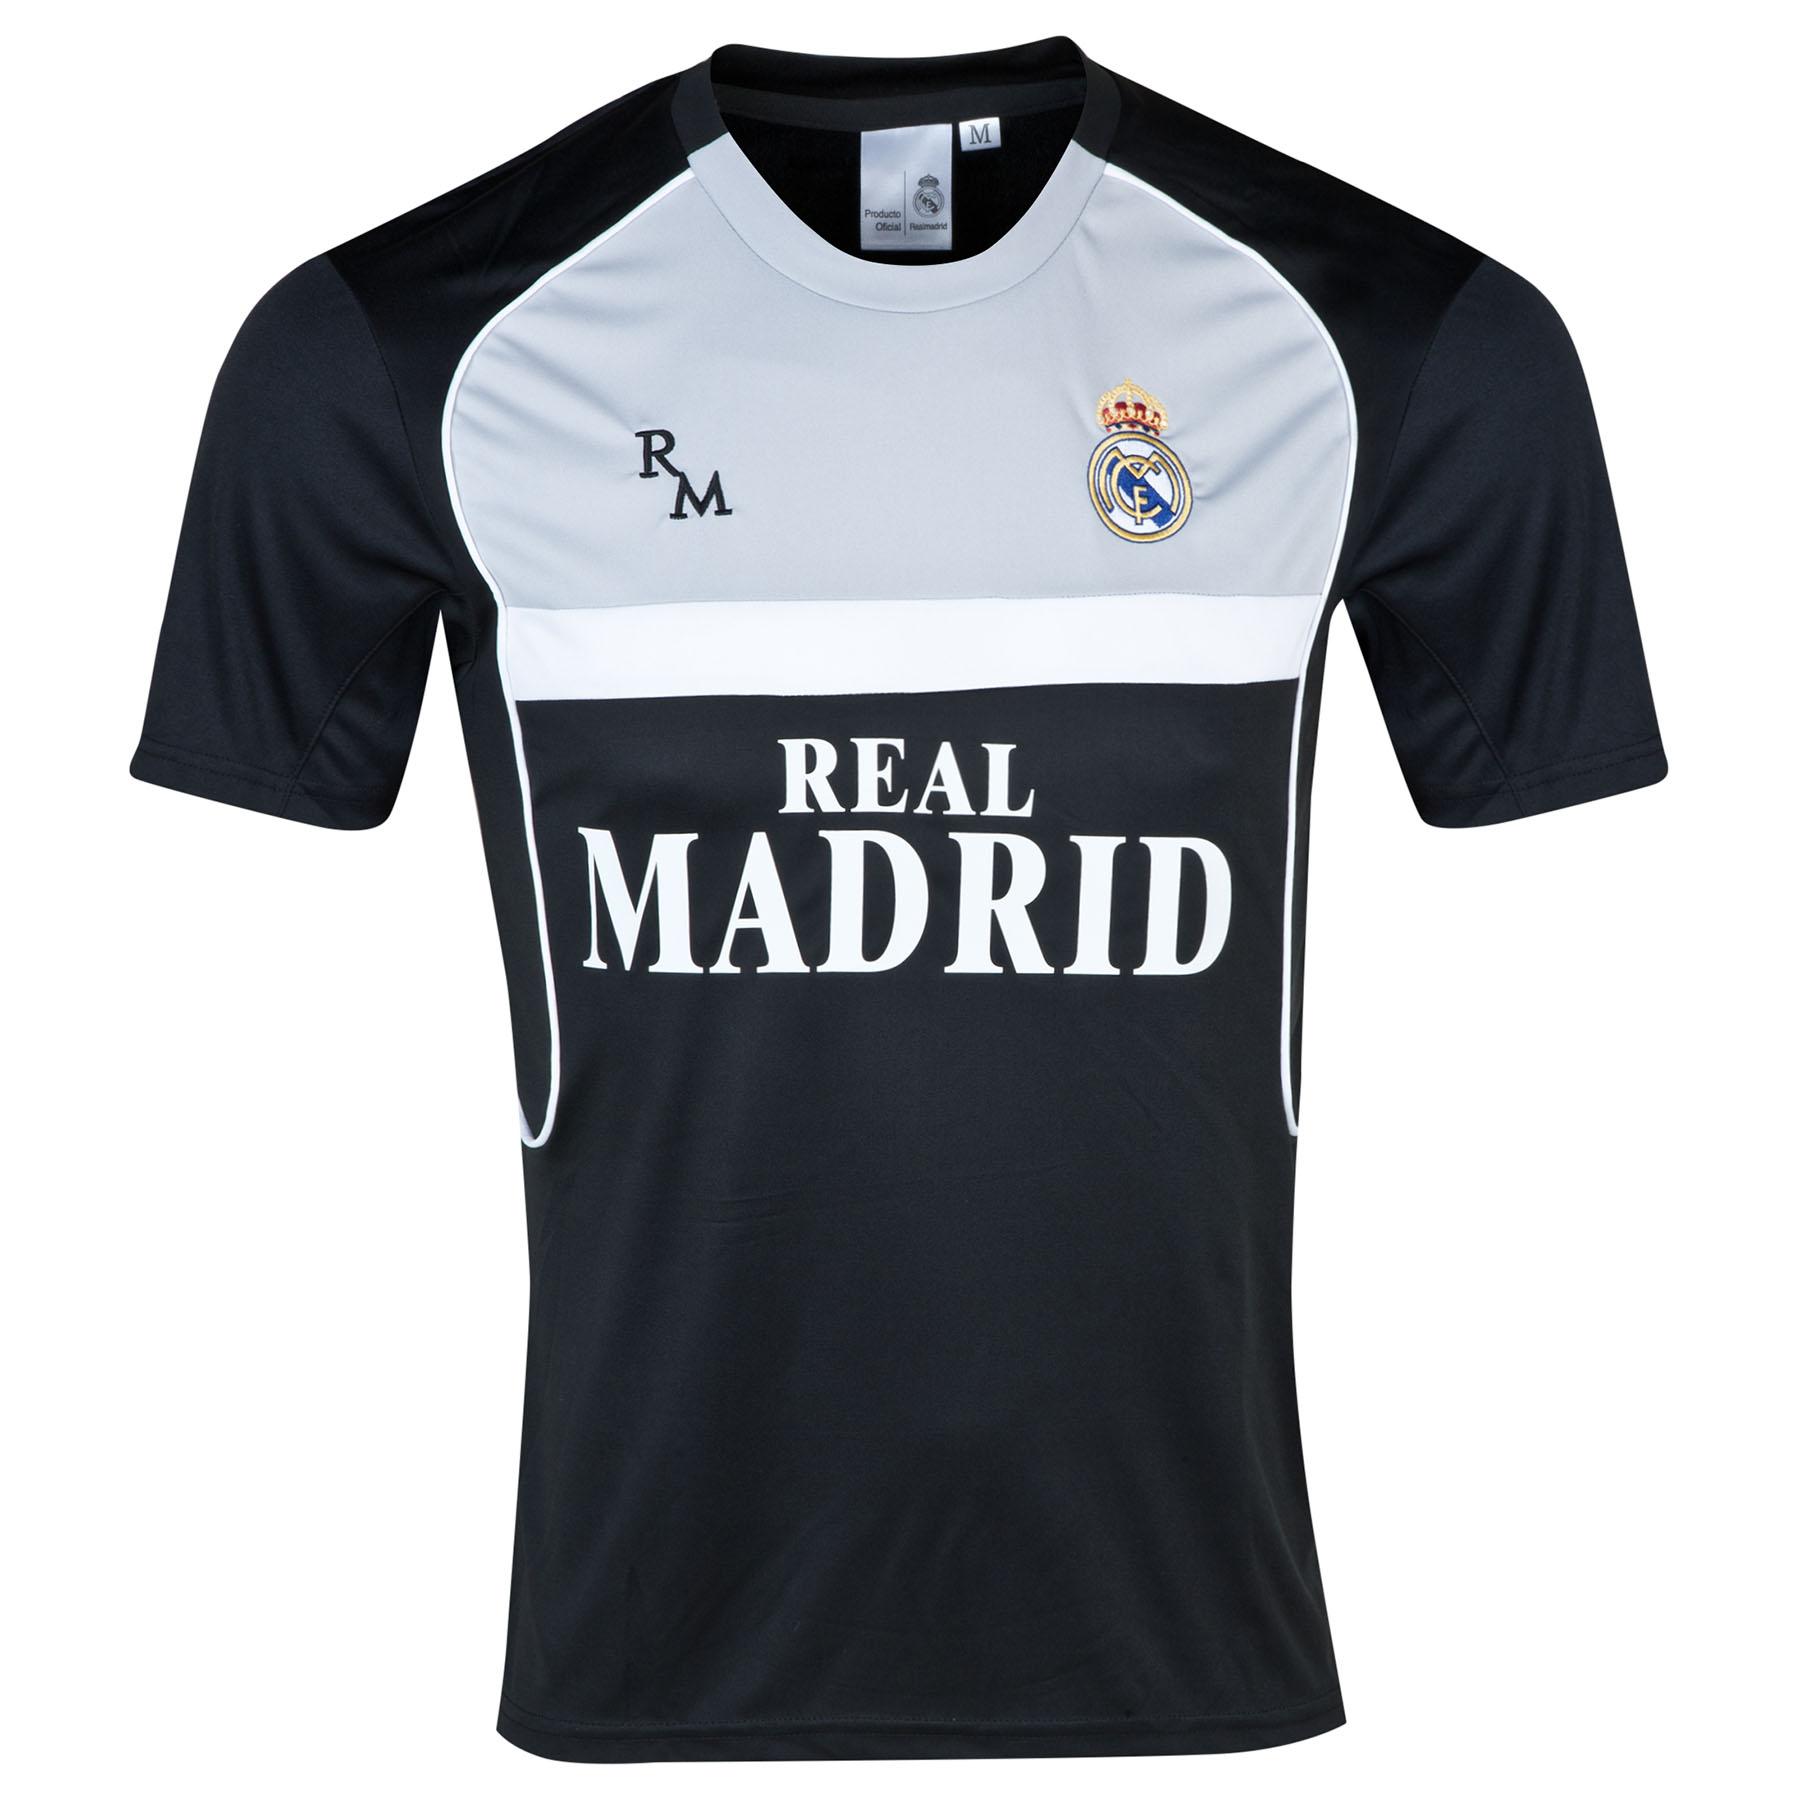 Camiseta para Hombre Real Madrid - Negra